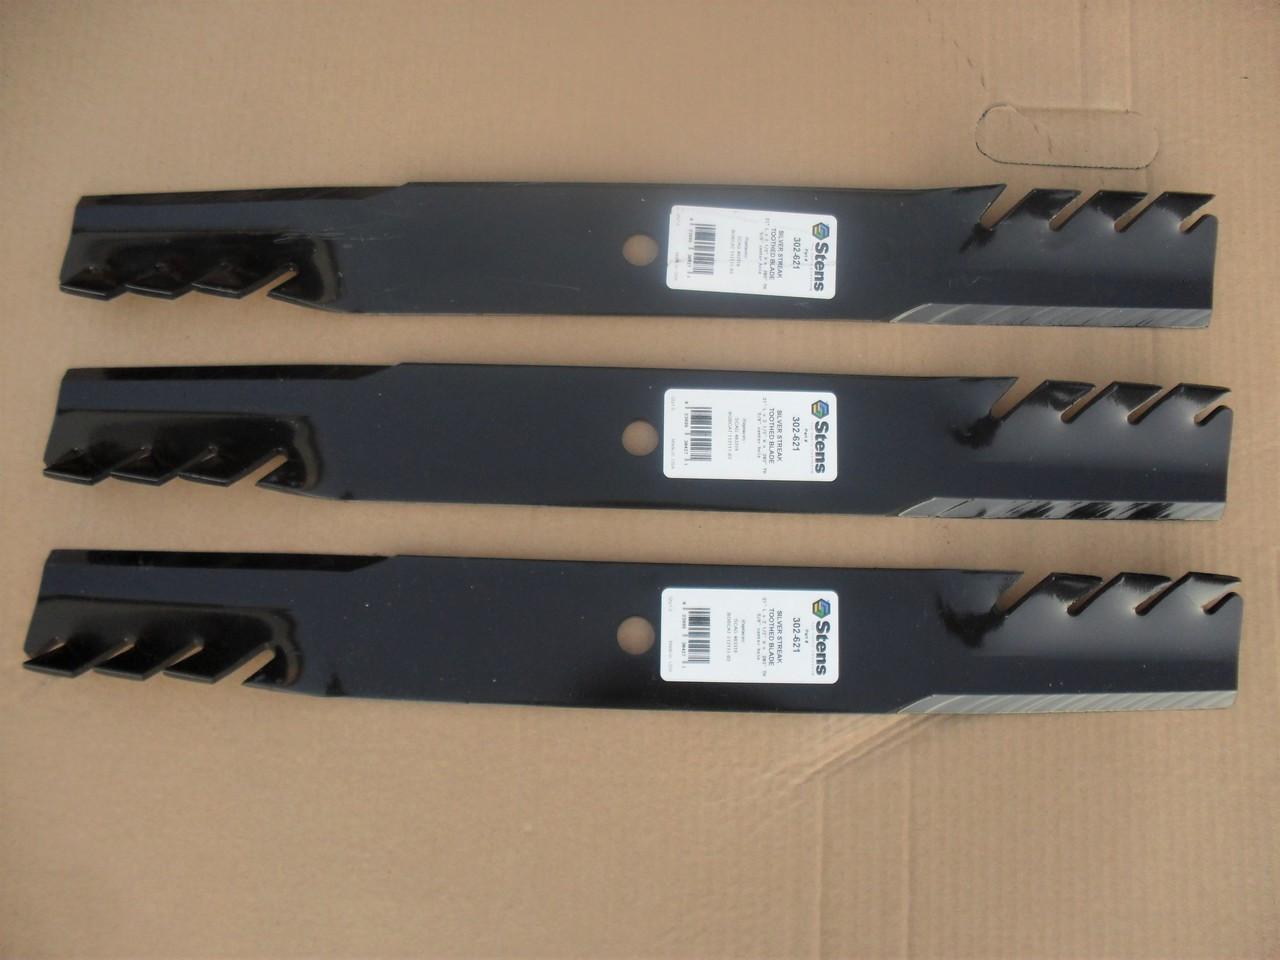 6 Stens 302-621 Toothed Blades Fits Husqvarna 539101733 539102093 Lastec P-246